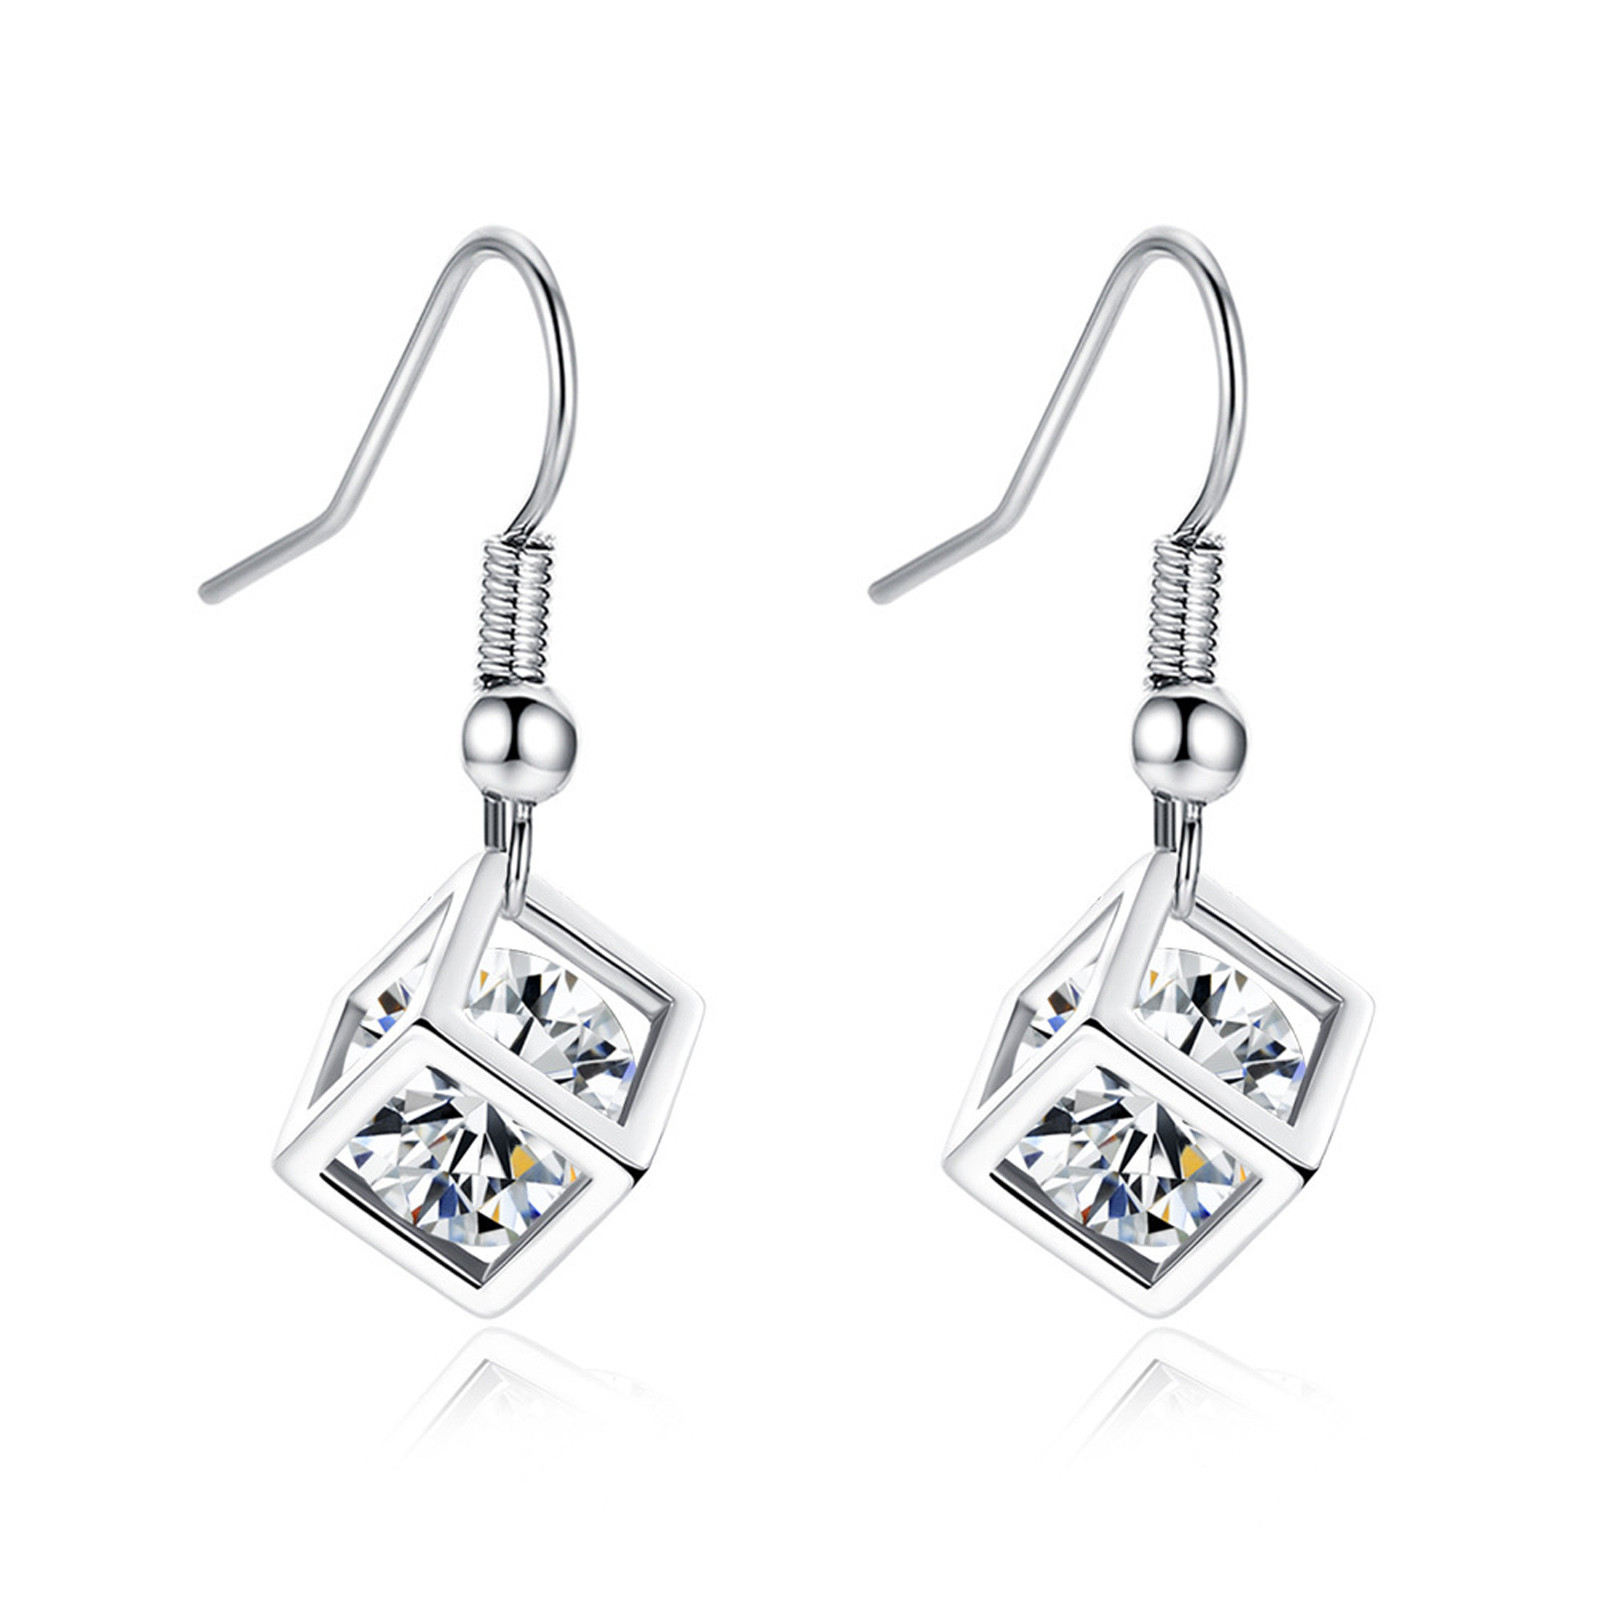 Stud-Earrings Wedding-Jewelry Rhinestone Elegant Dangle Fashion-Style Women Hoop Square